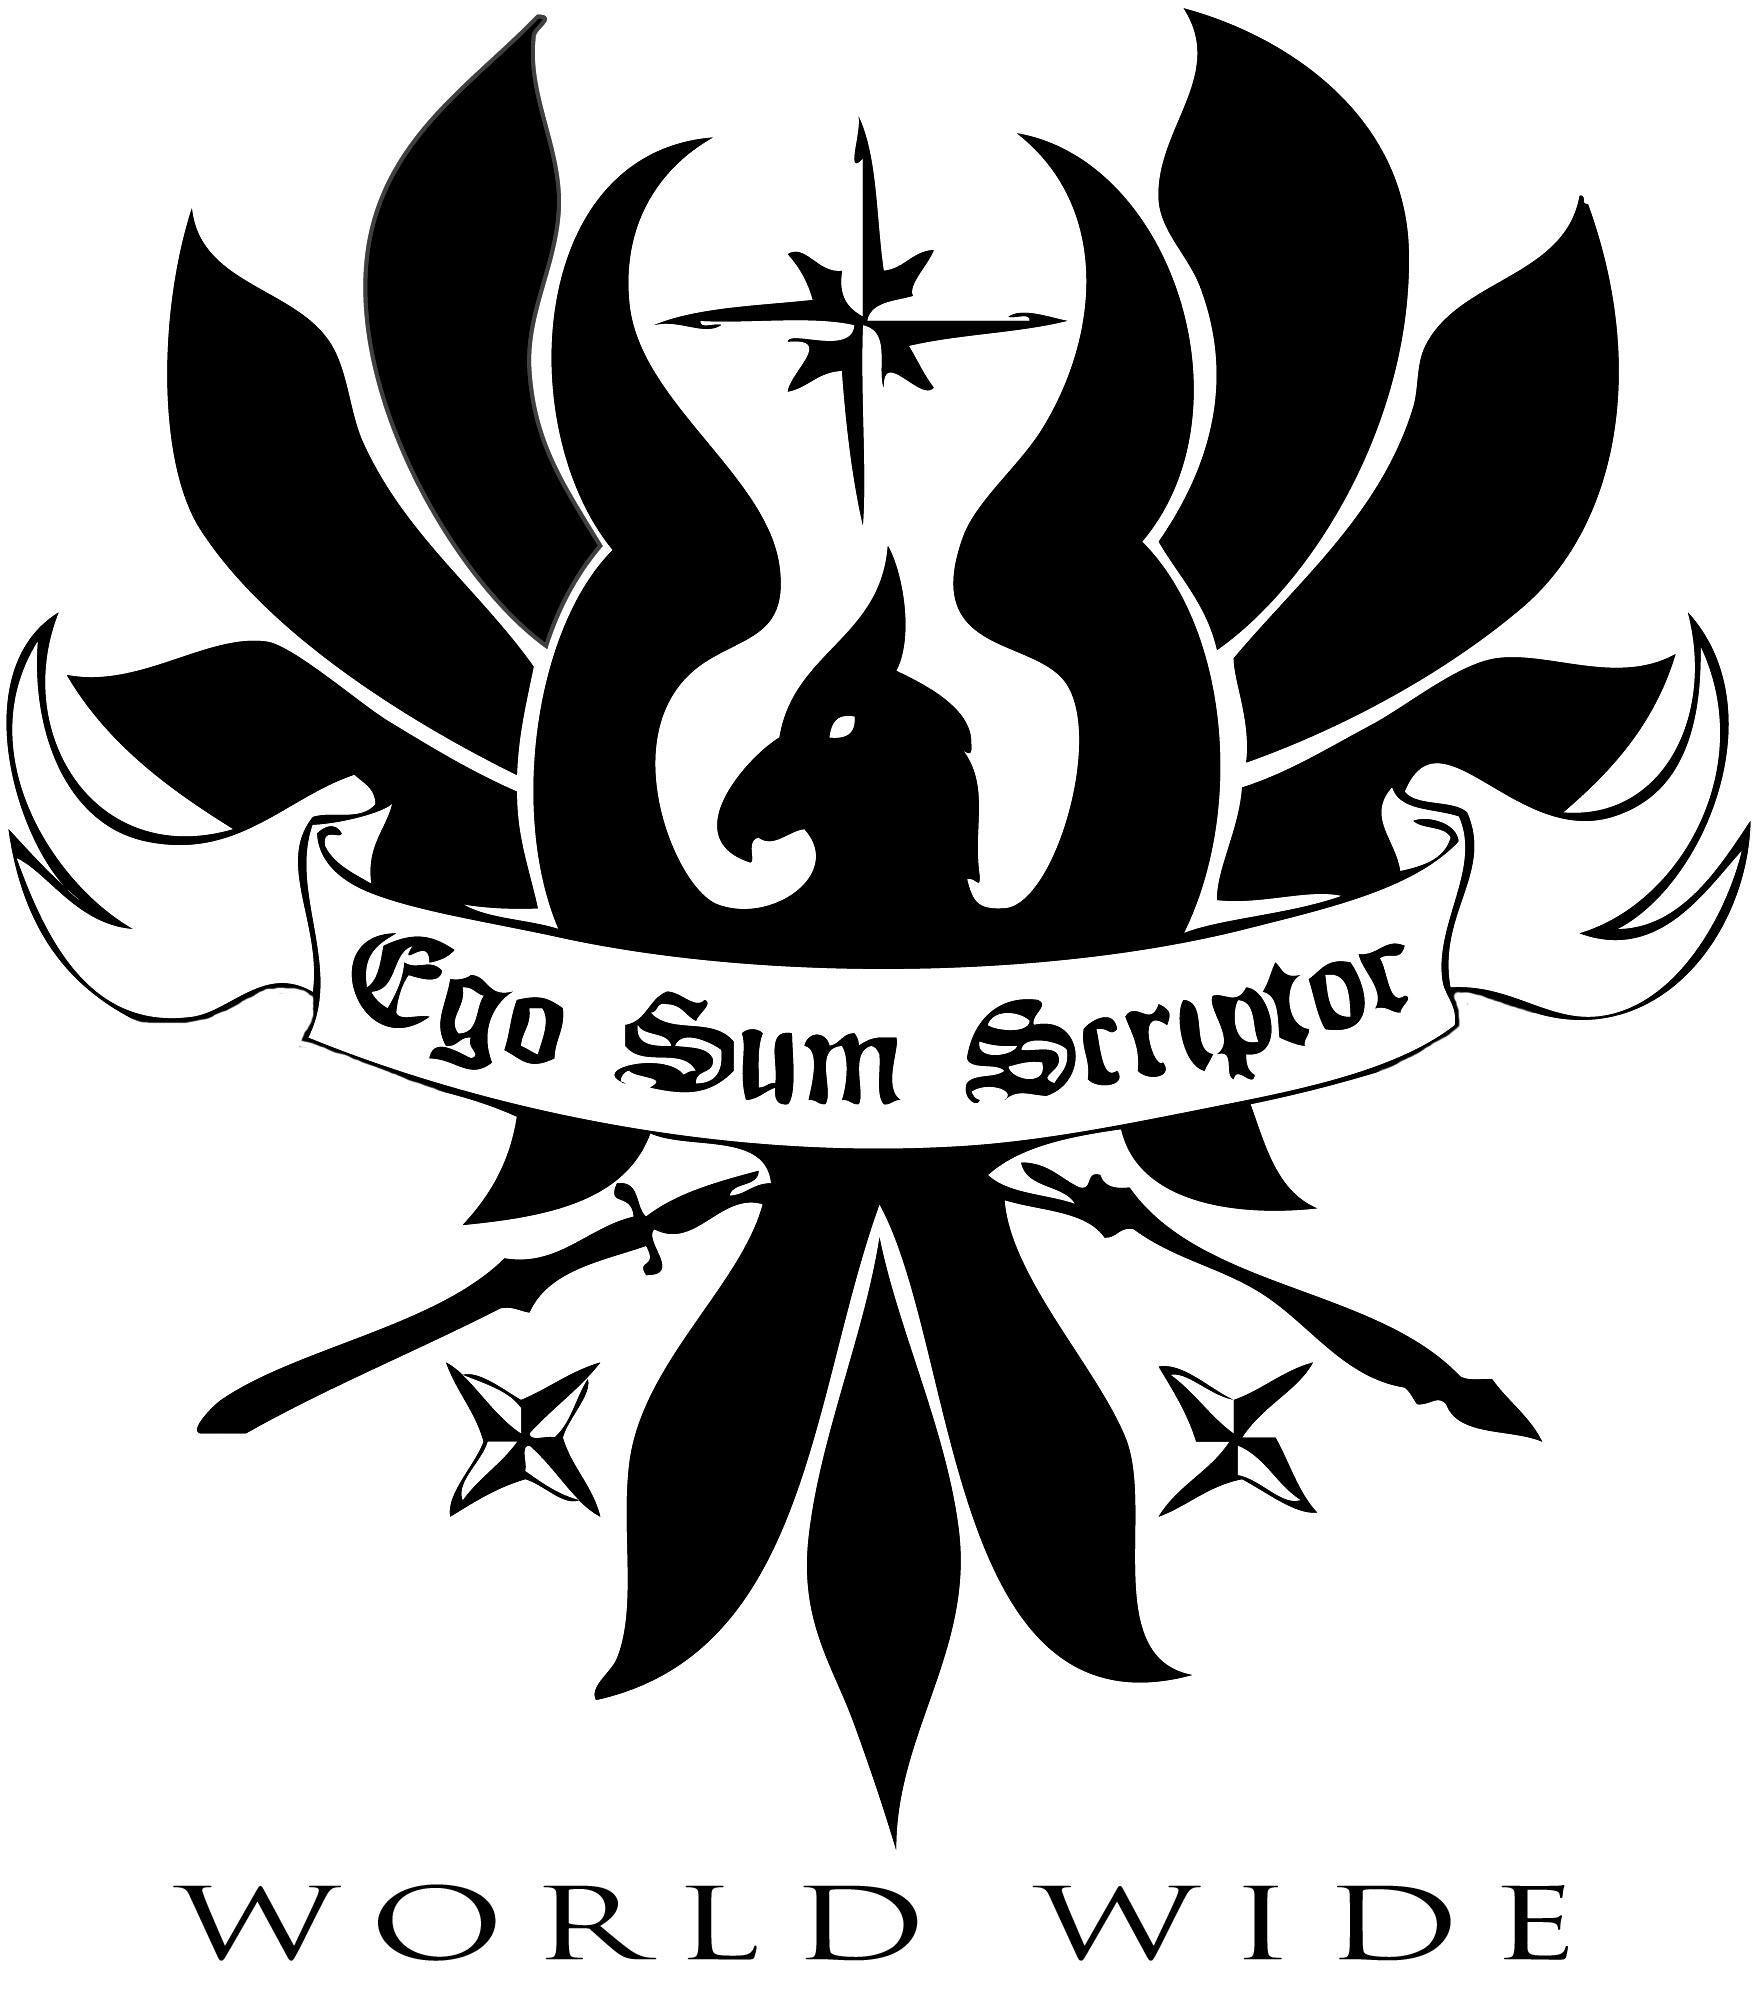 ego sum scriptor logo